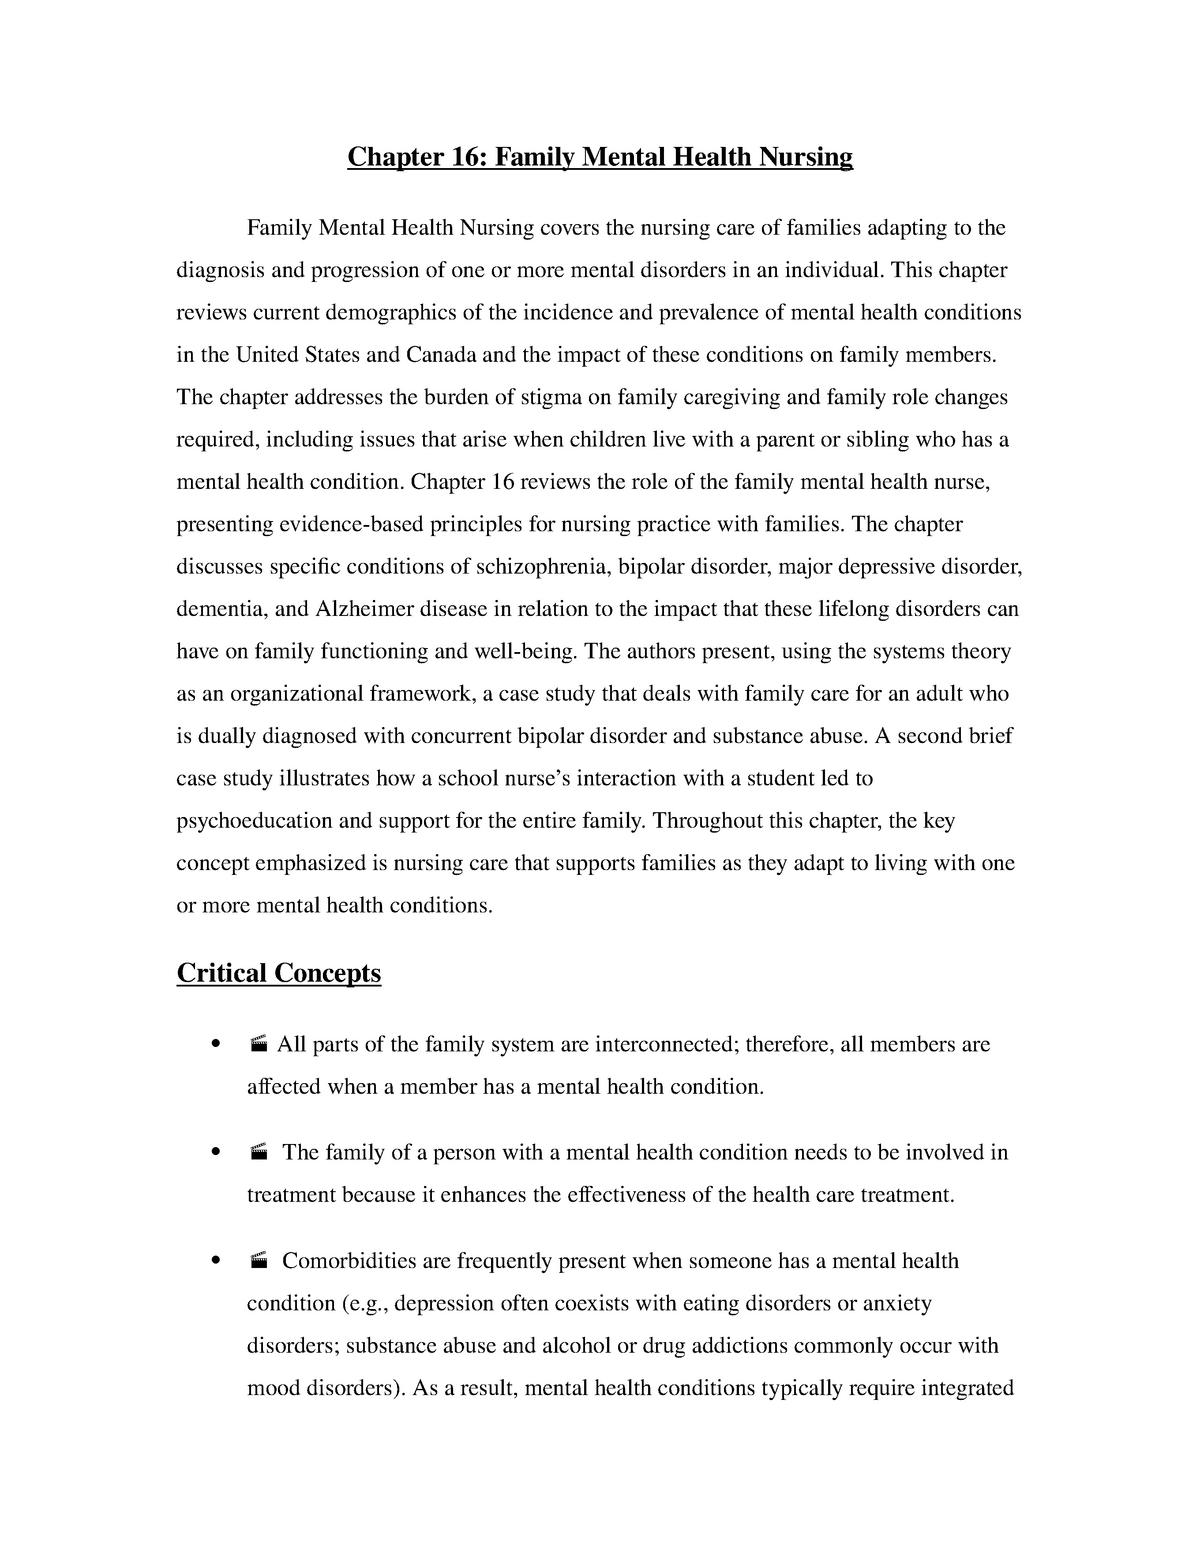 Chapter 16: Family Mental Health Nursing - CNUR 300 - StuDocu